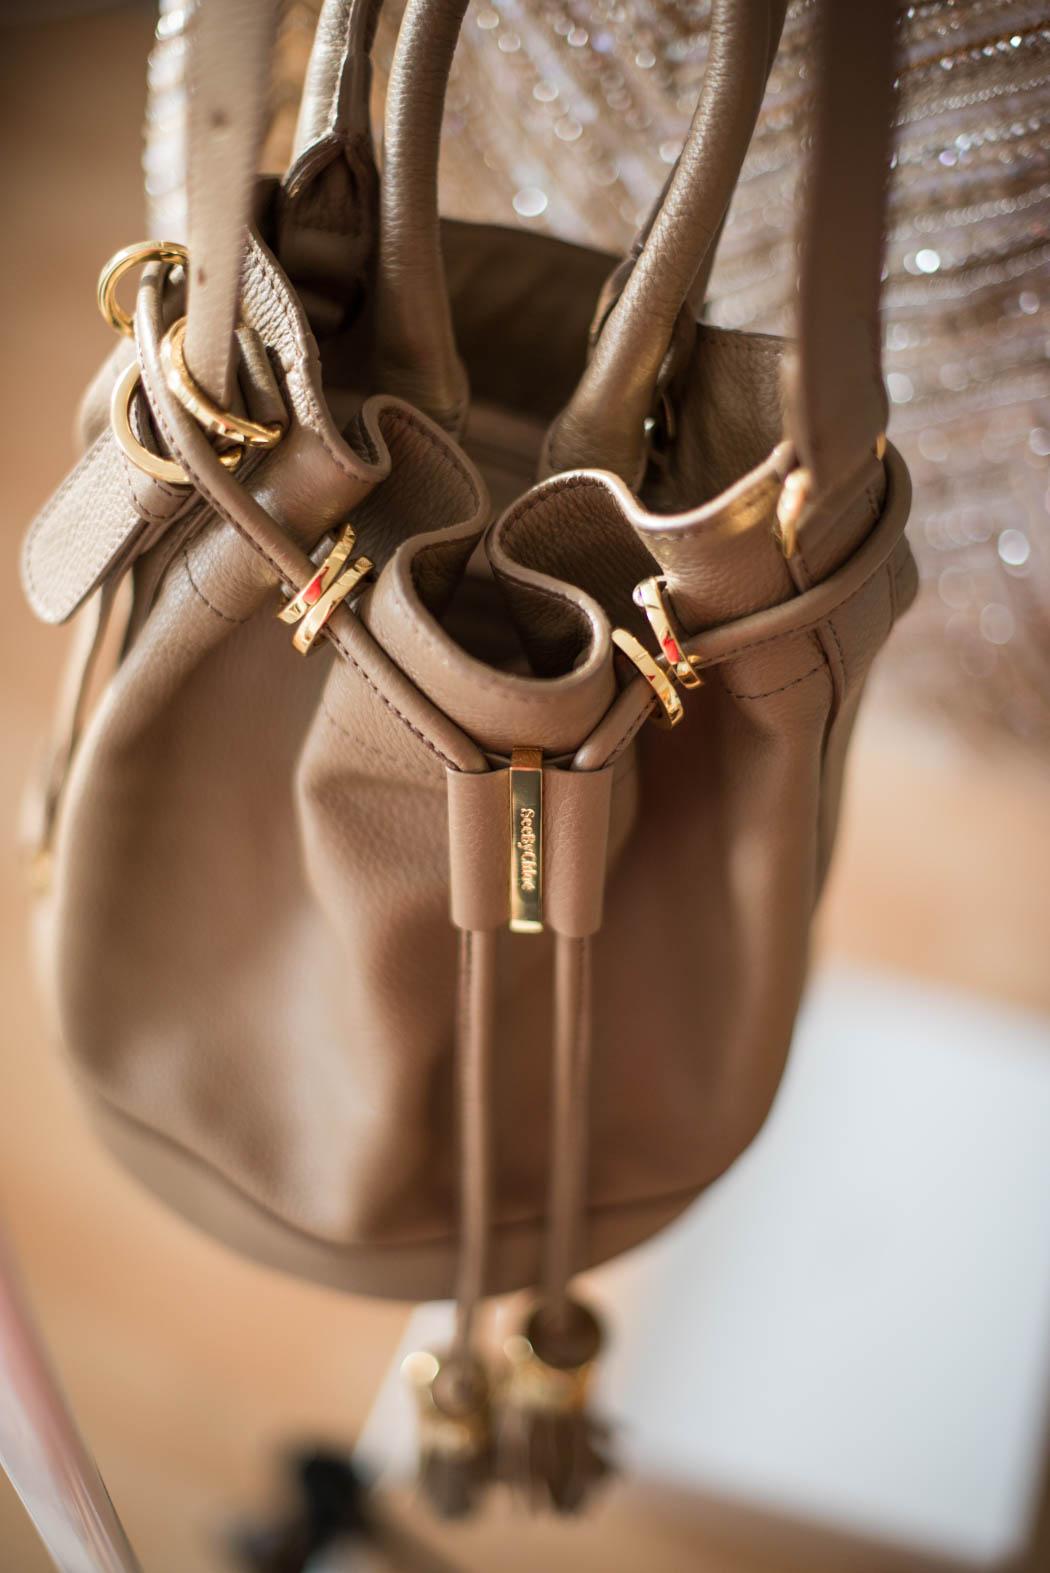 Shoppinghaul-Blogger-Deutschland-Chloe-Marcie-Bag-Massimo-Dutti-5